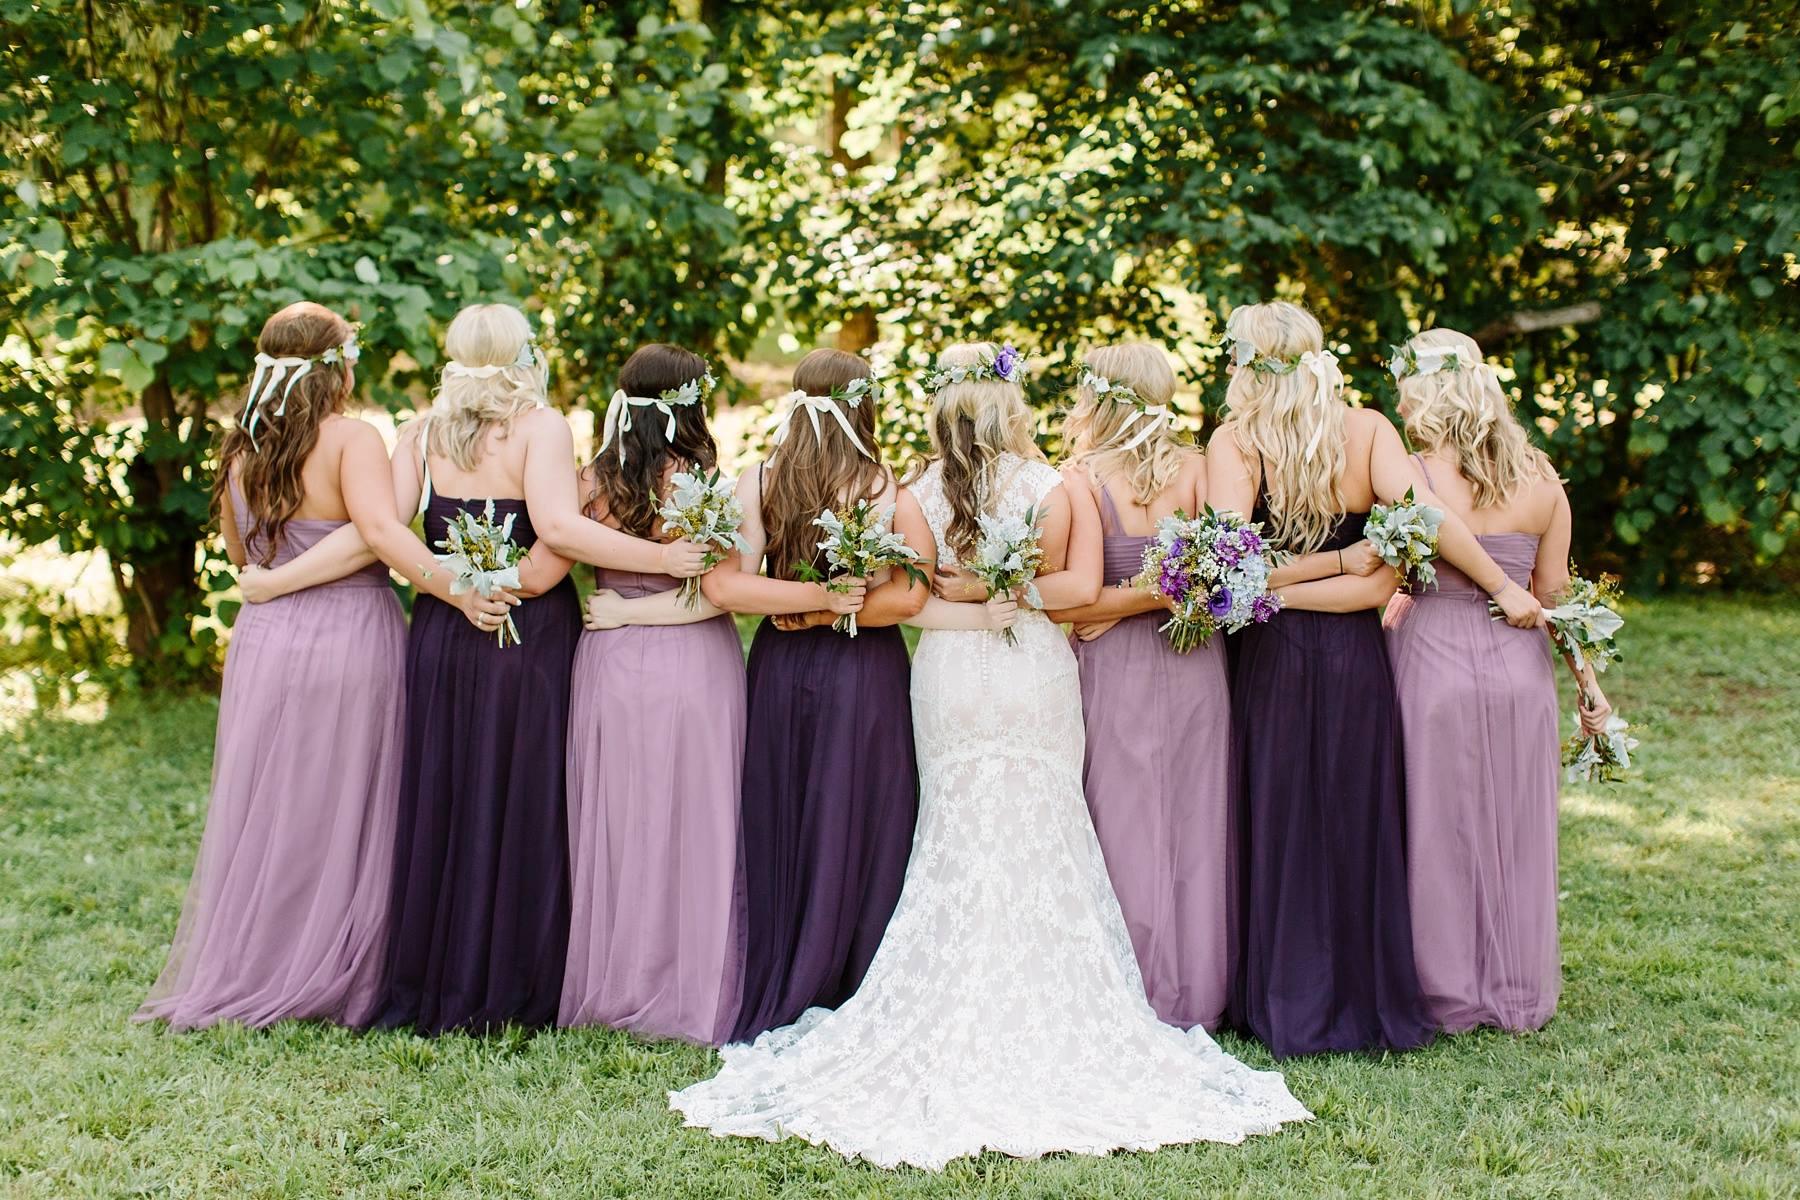 Erin Wilson Photography , from  Courtney + Matt 's wedding